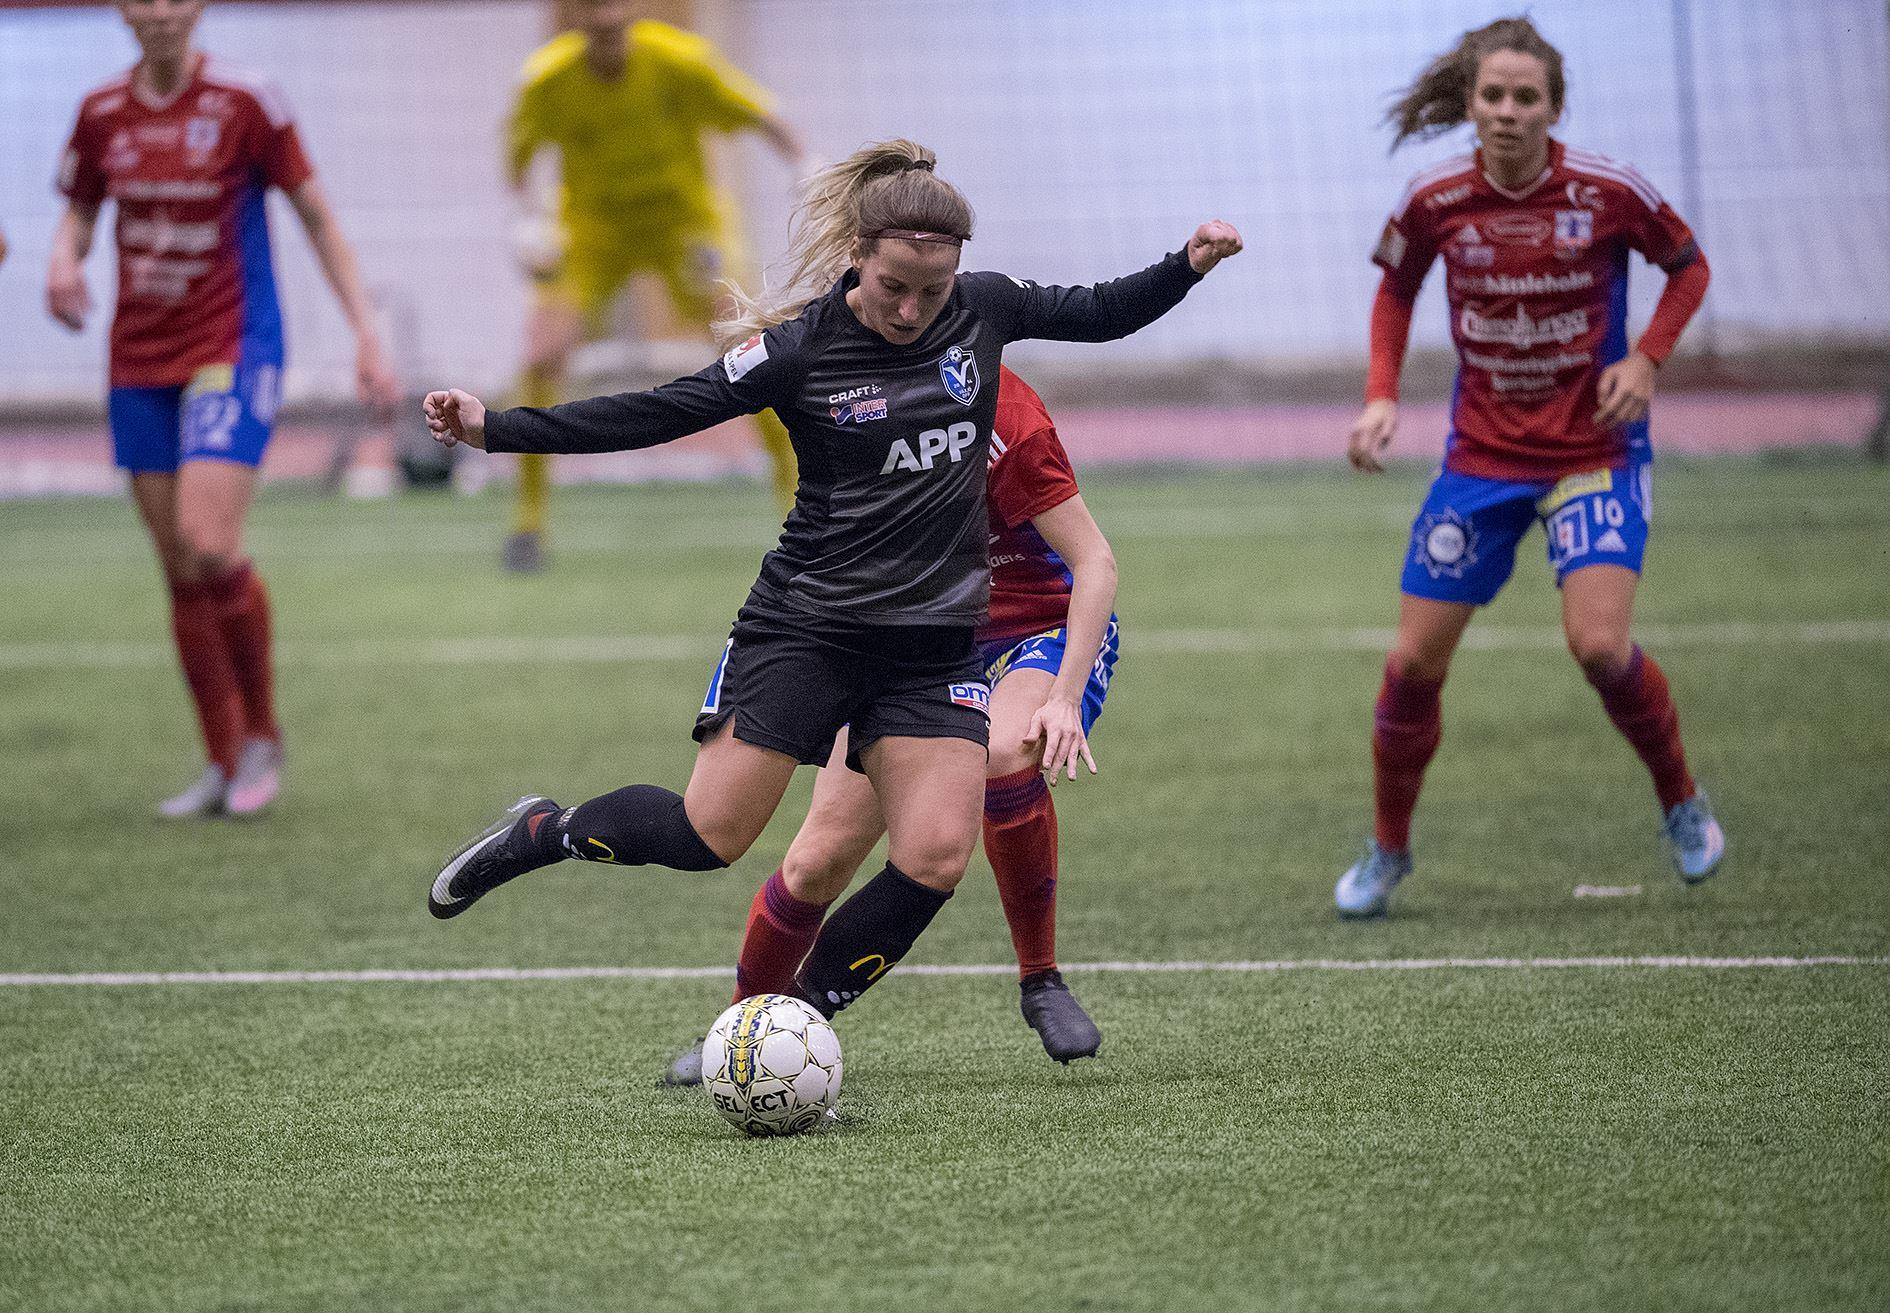 Fotboll: Växjö DFF - Eskilstuna United DFF